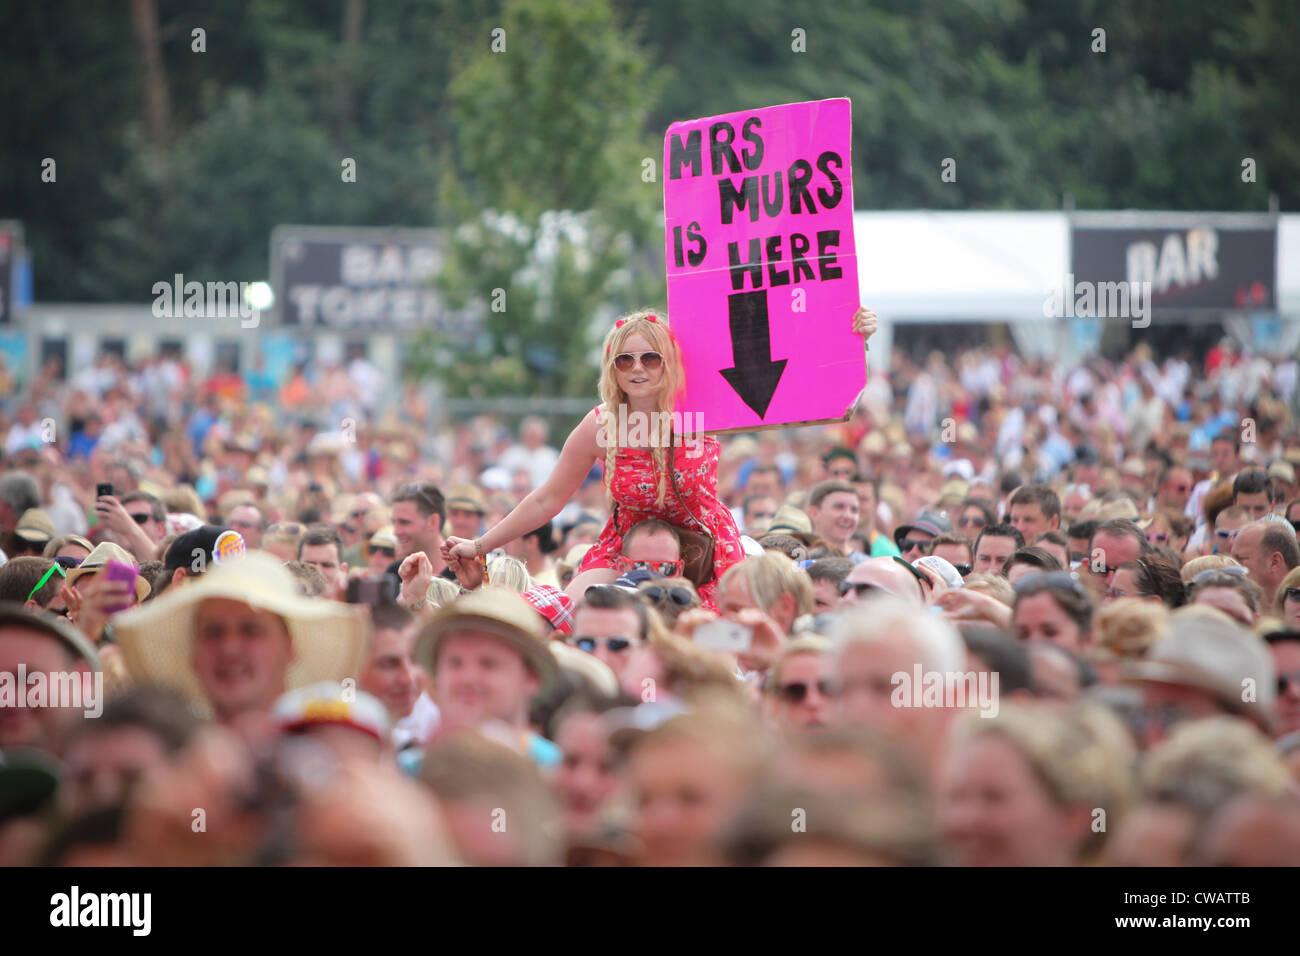 Proposal Funny Imágenes De Stock & Proposal Funny Fotos De Stock - Alamy